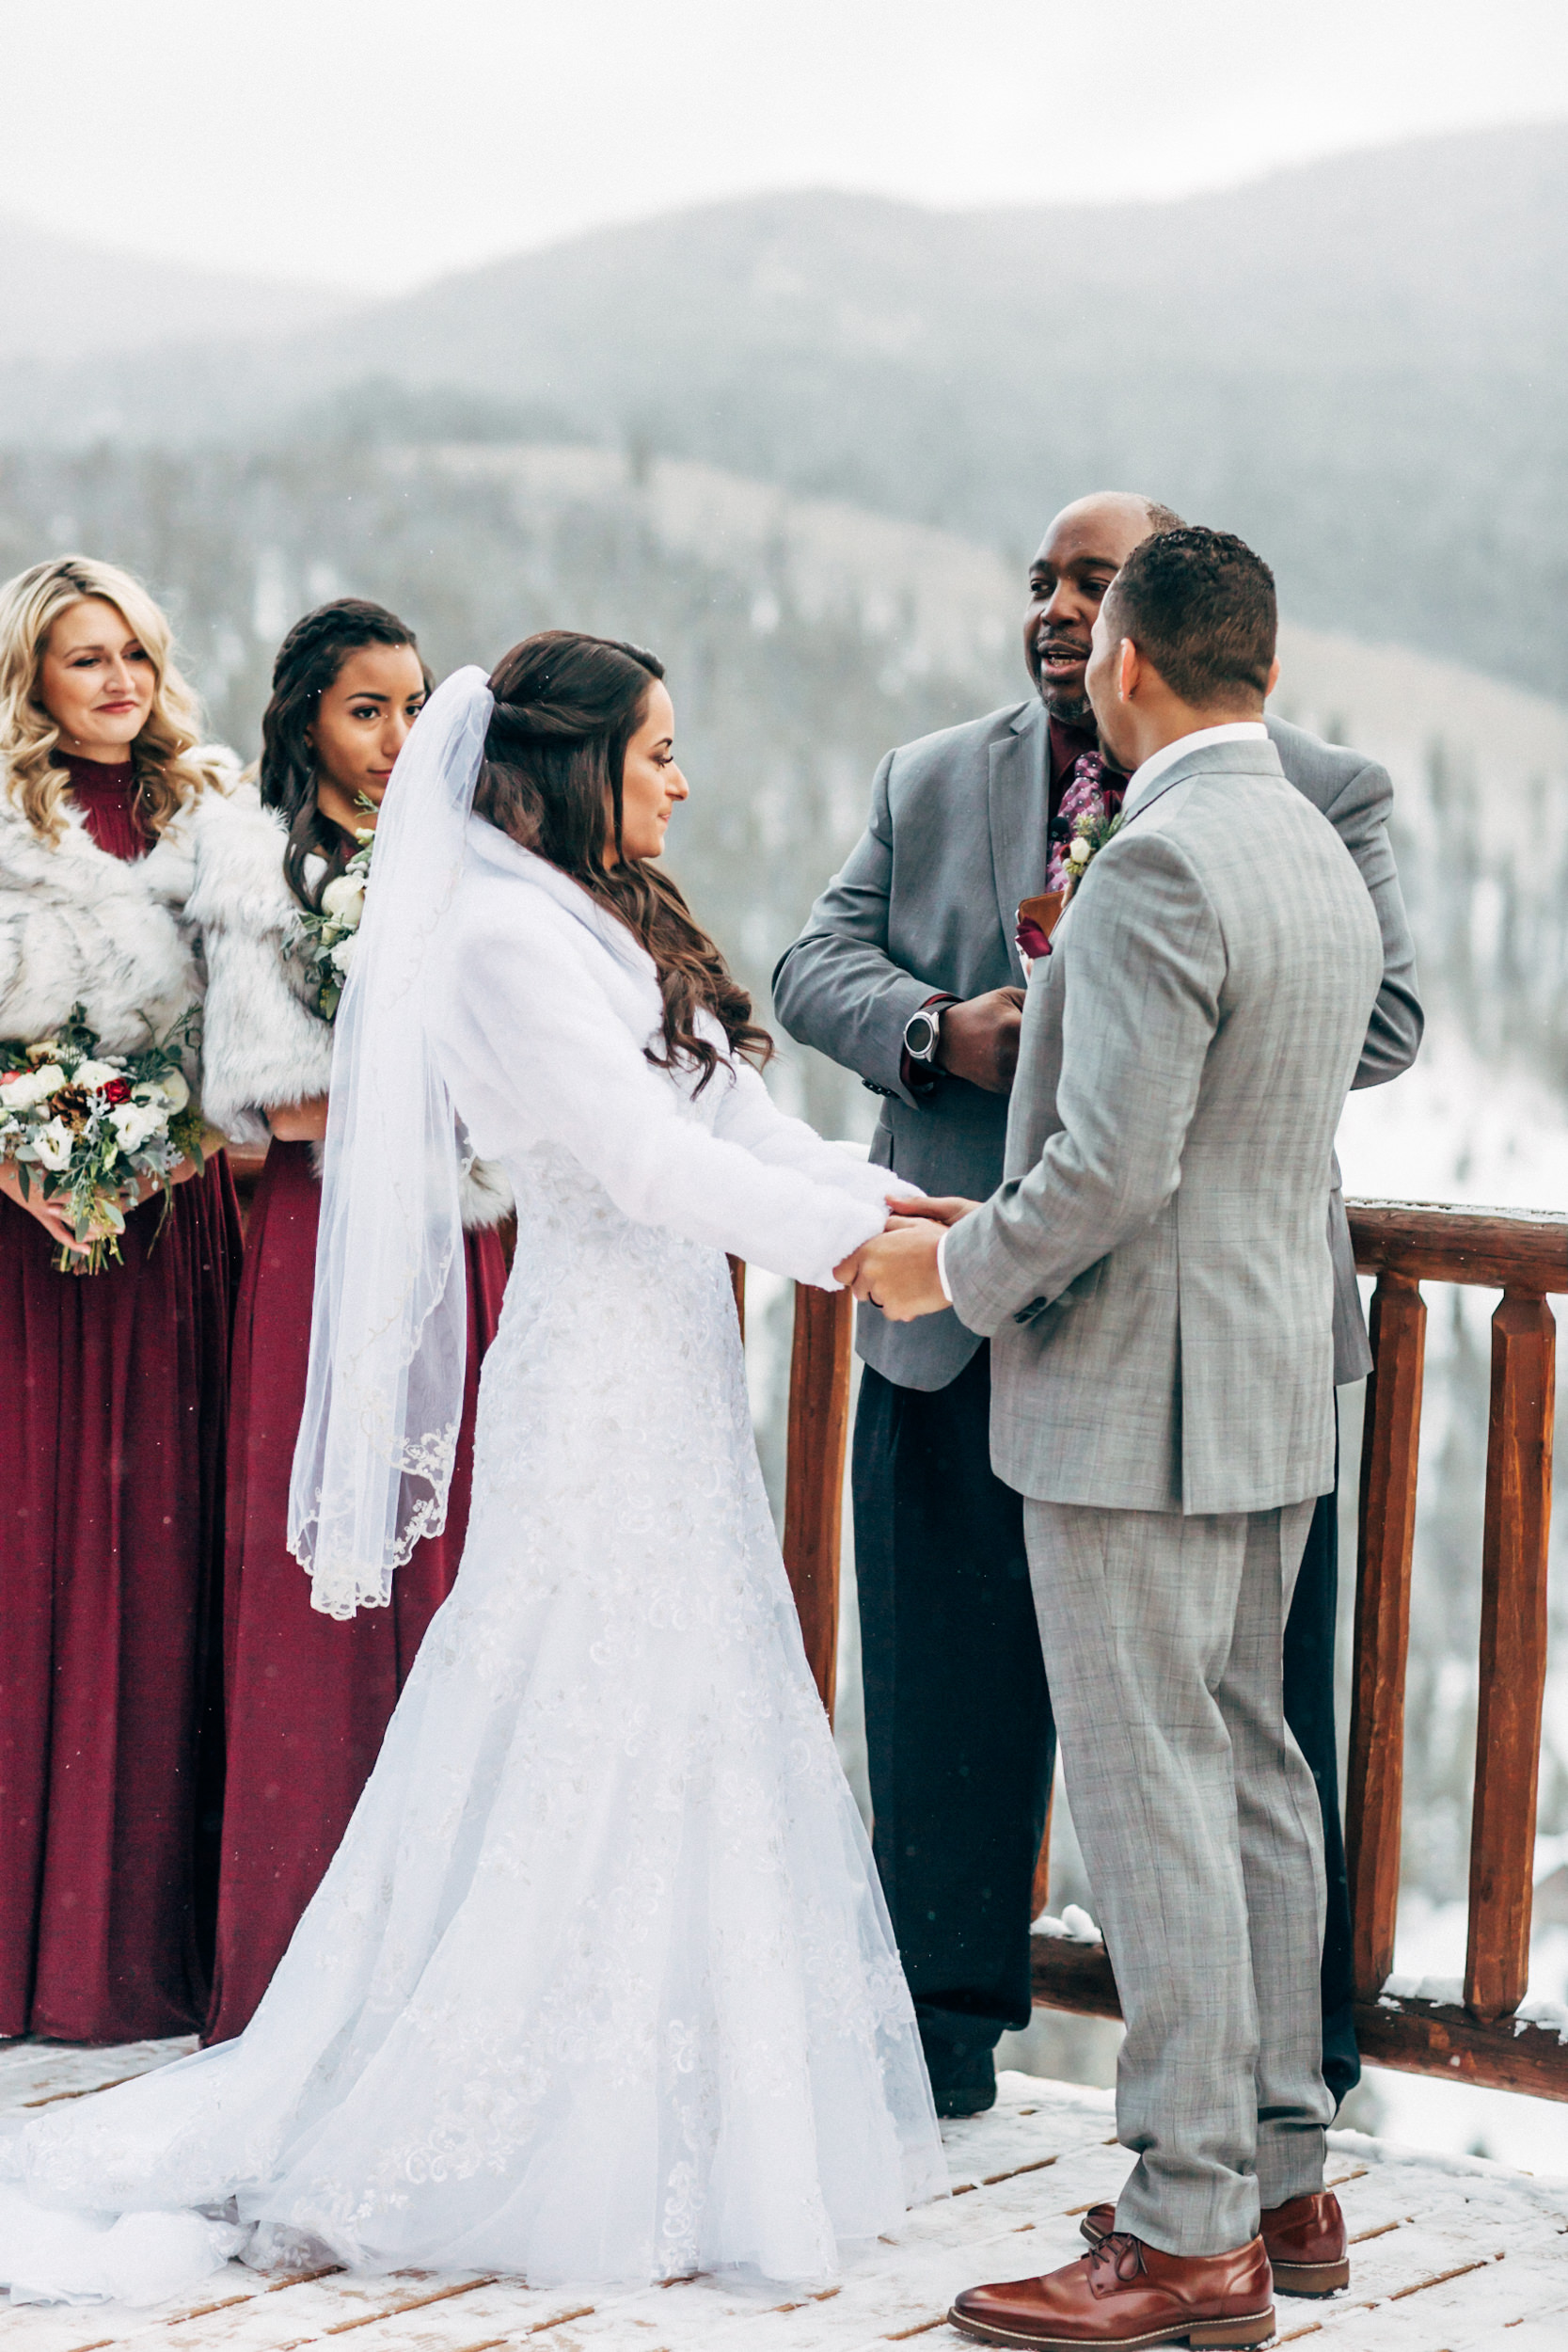 Colorado-Wedding-Photographer-Breckinridge-Mountain-Adventure-Elopement-59.jpg